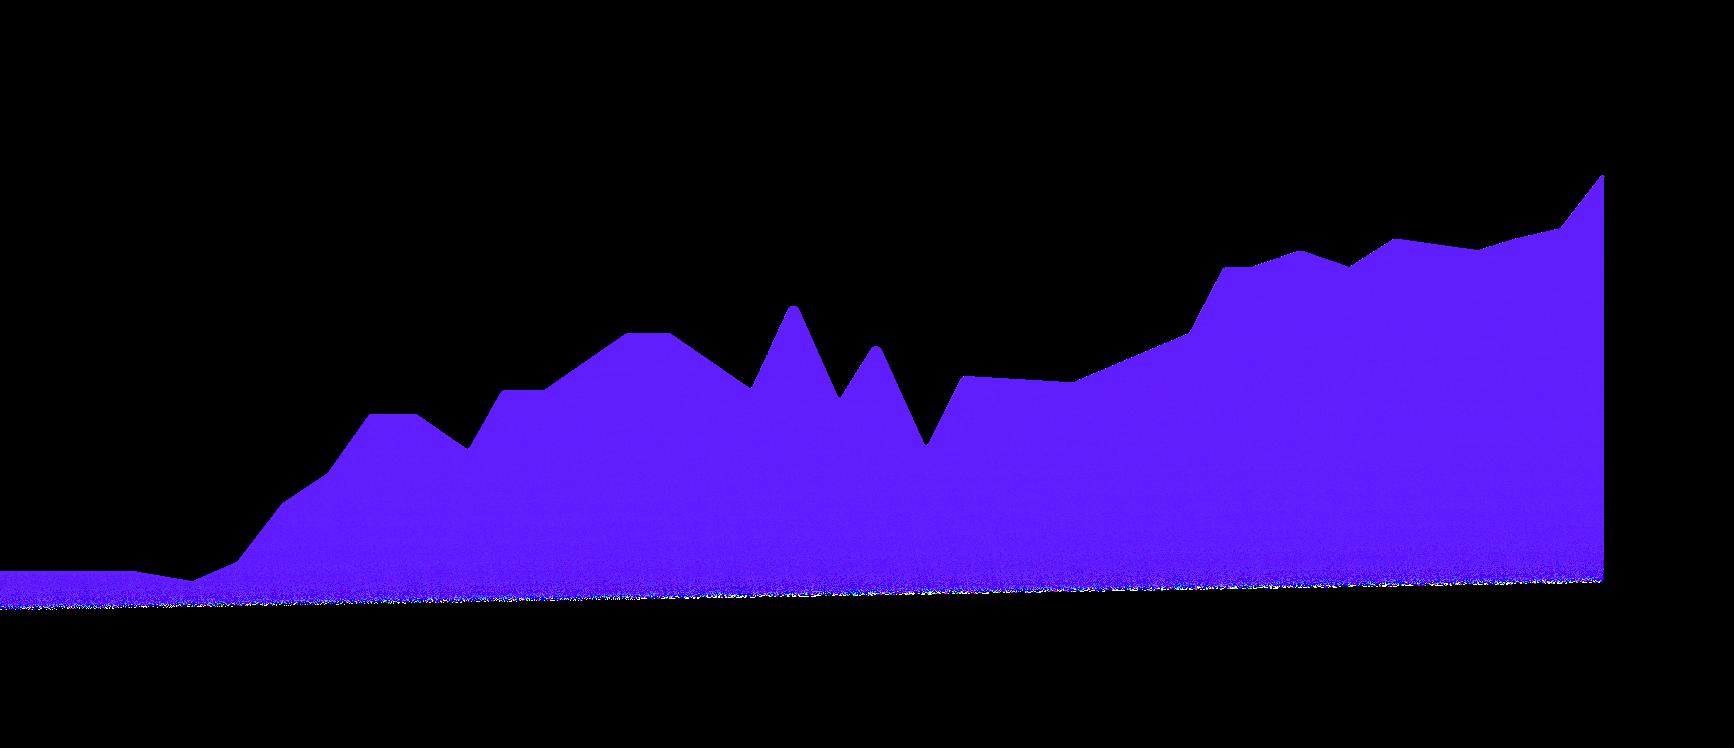 Macro Sentiment Returns Chart